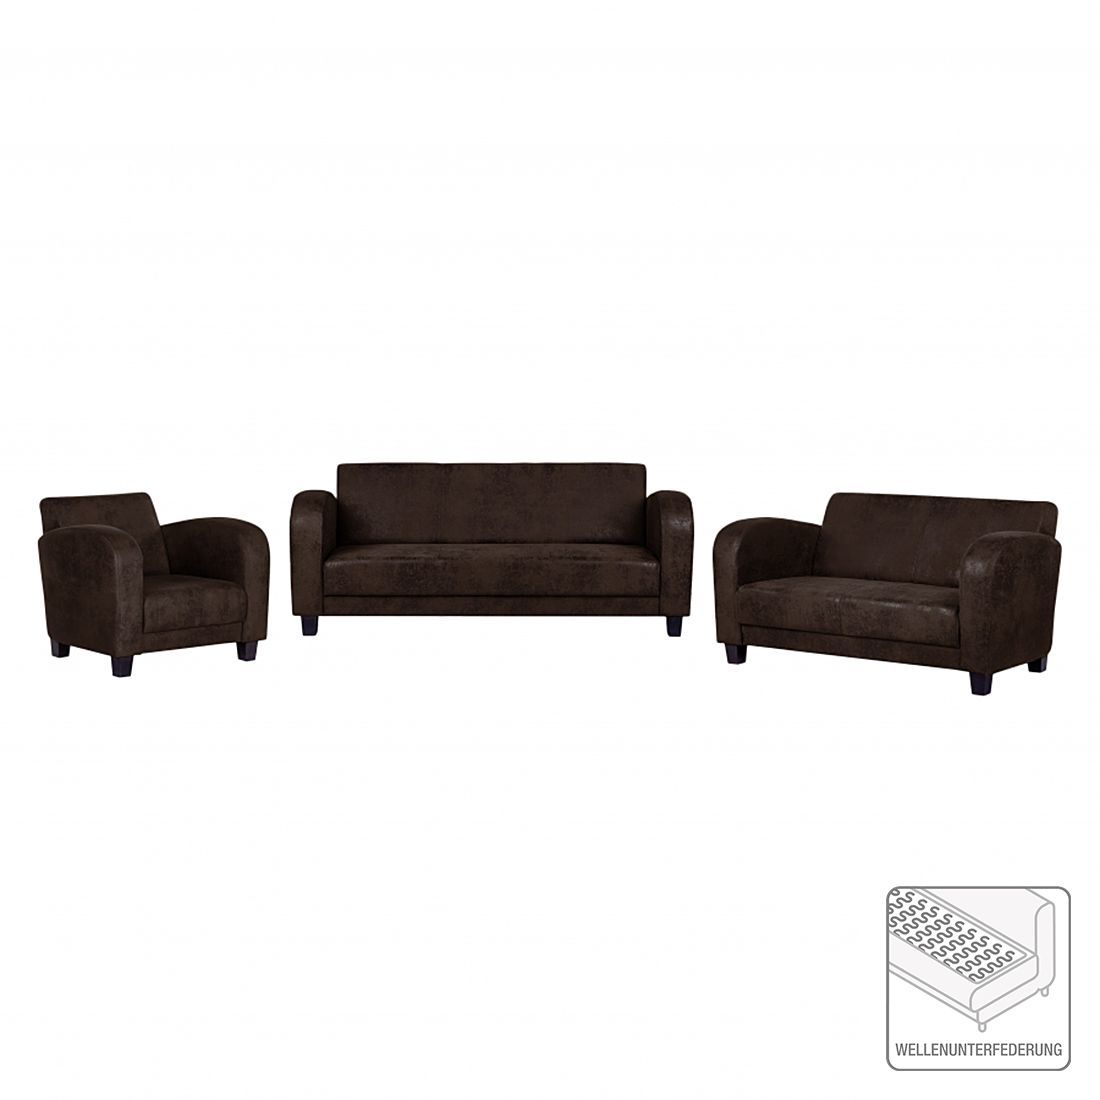 Canape Panoramique Tullow 3 2 1 Braunes Sofa Niedriger Couchtisch Mobel Kaufen